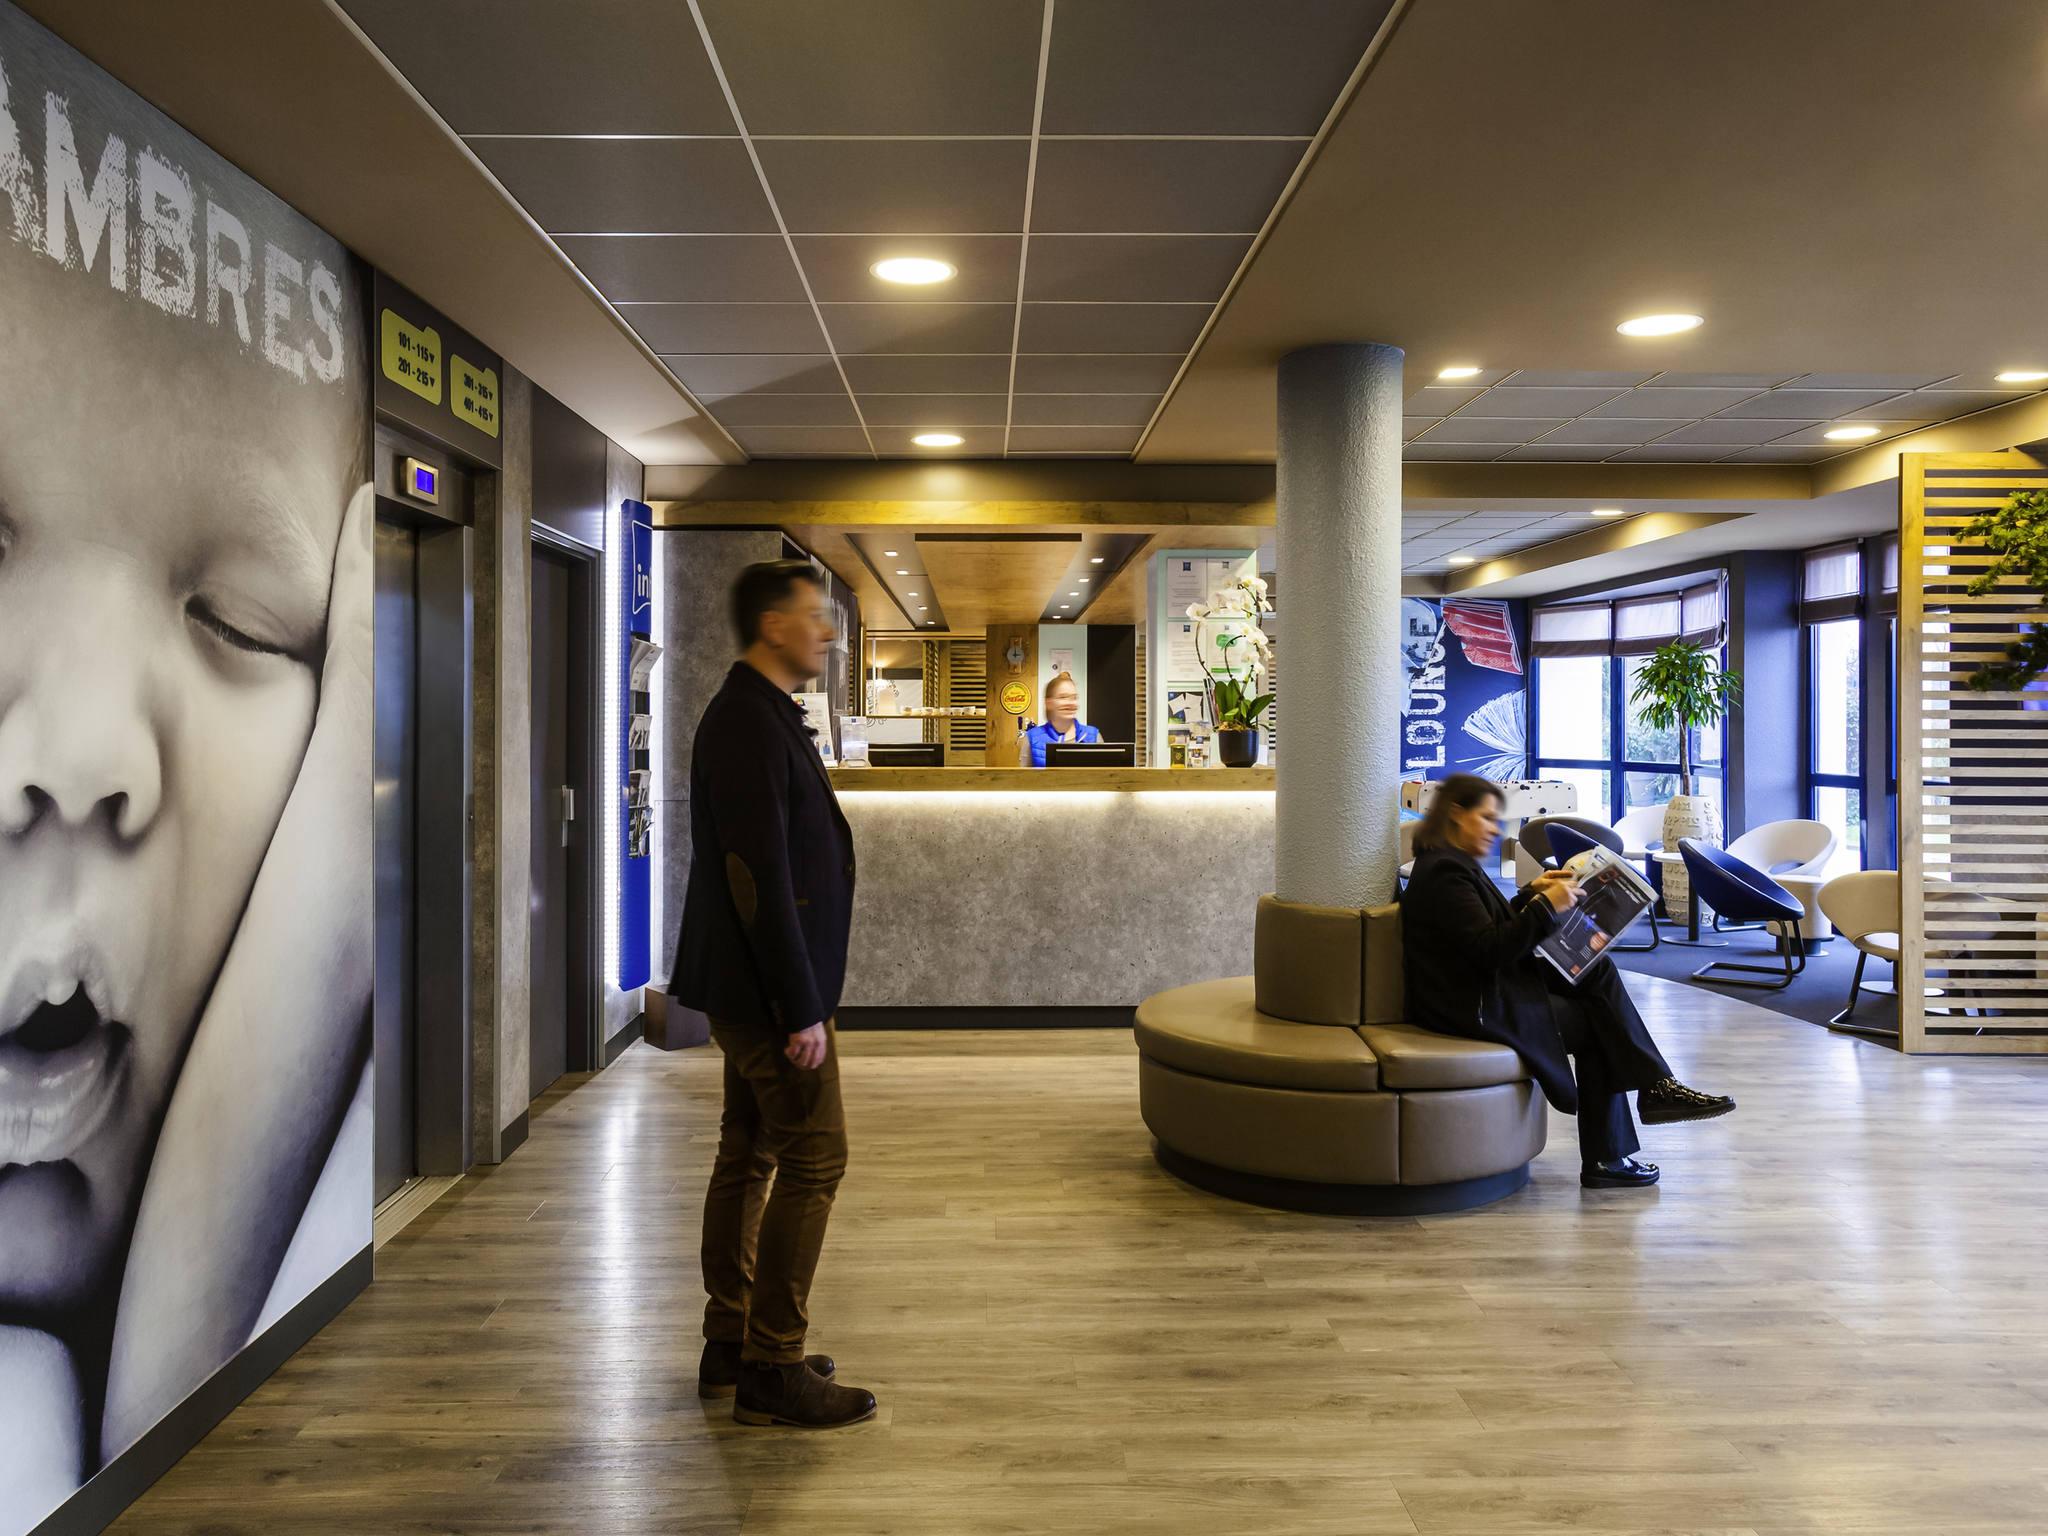 Hotel – ibis budget Marne-la-Vallée Pontault-Combault